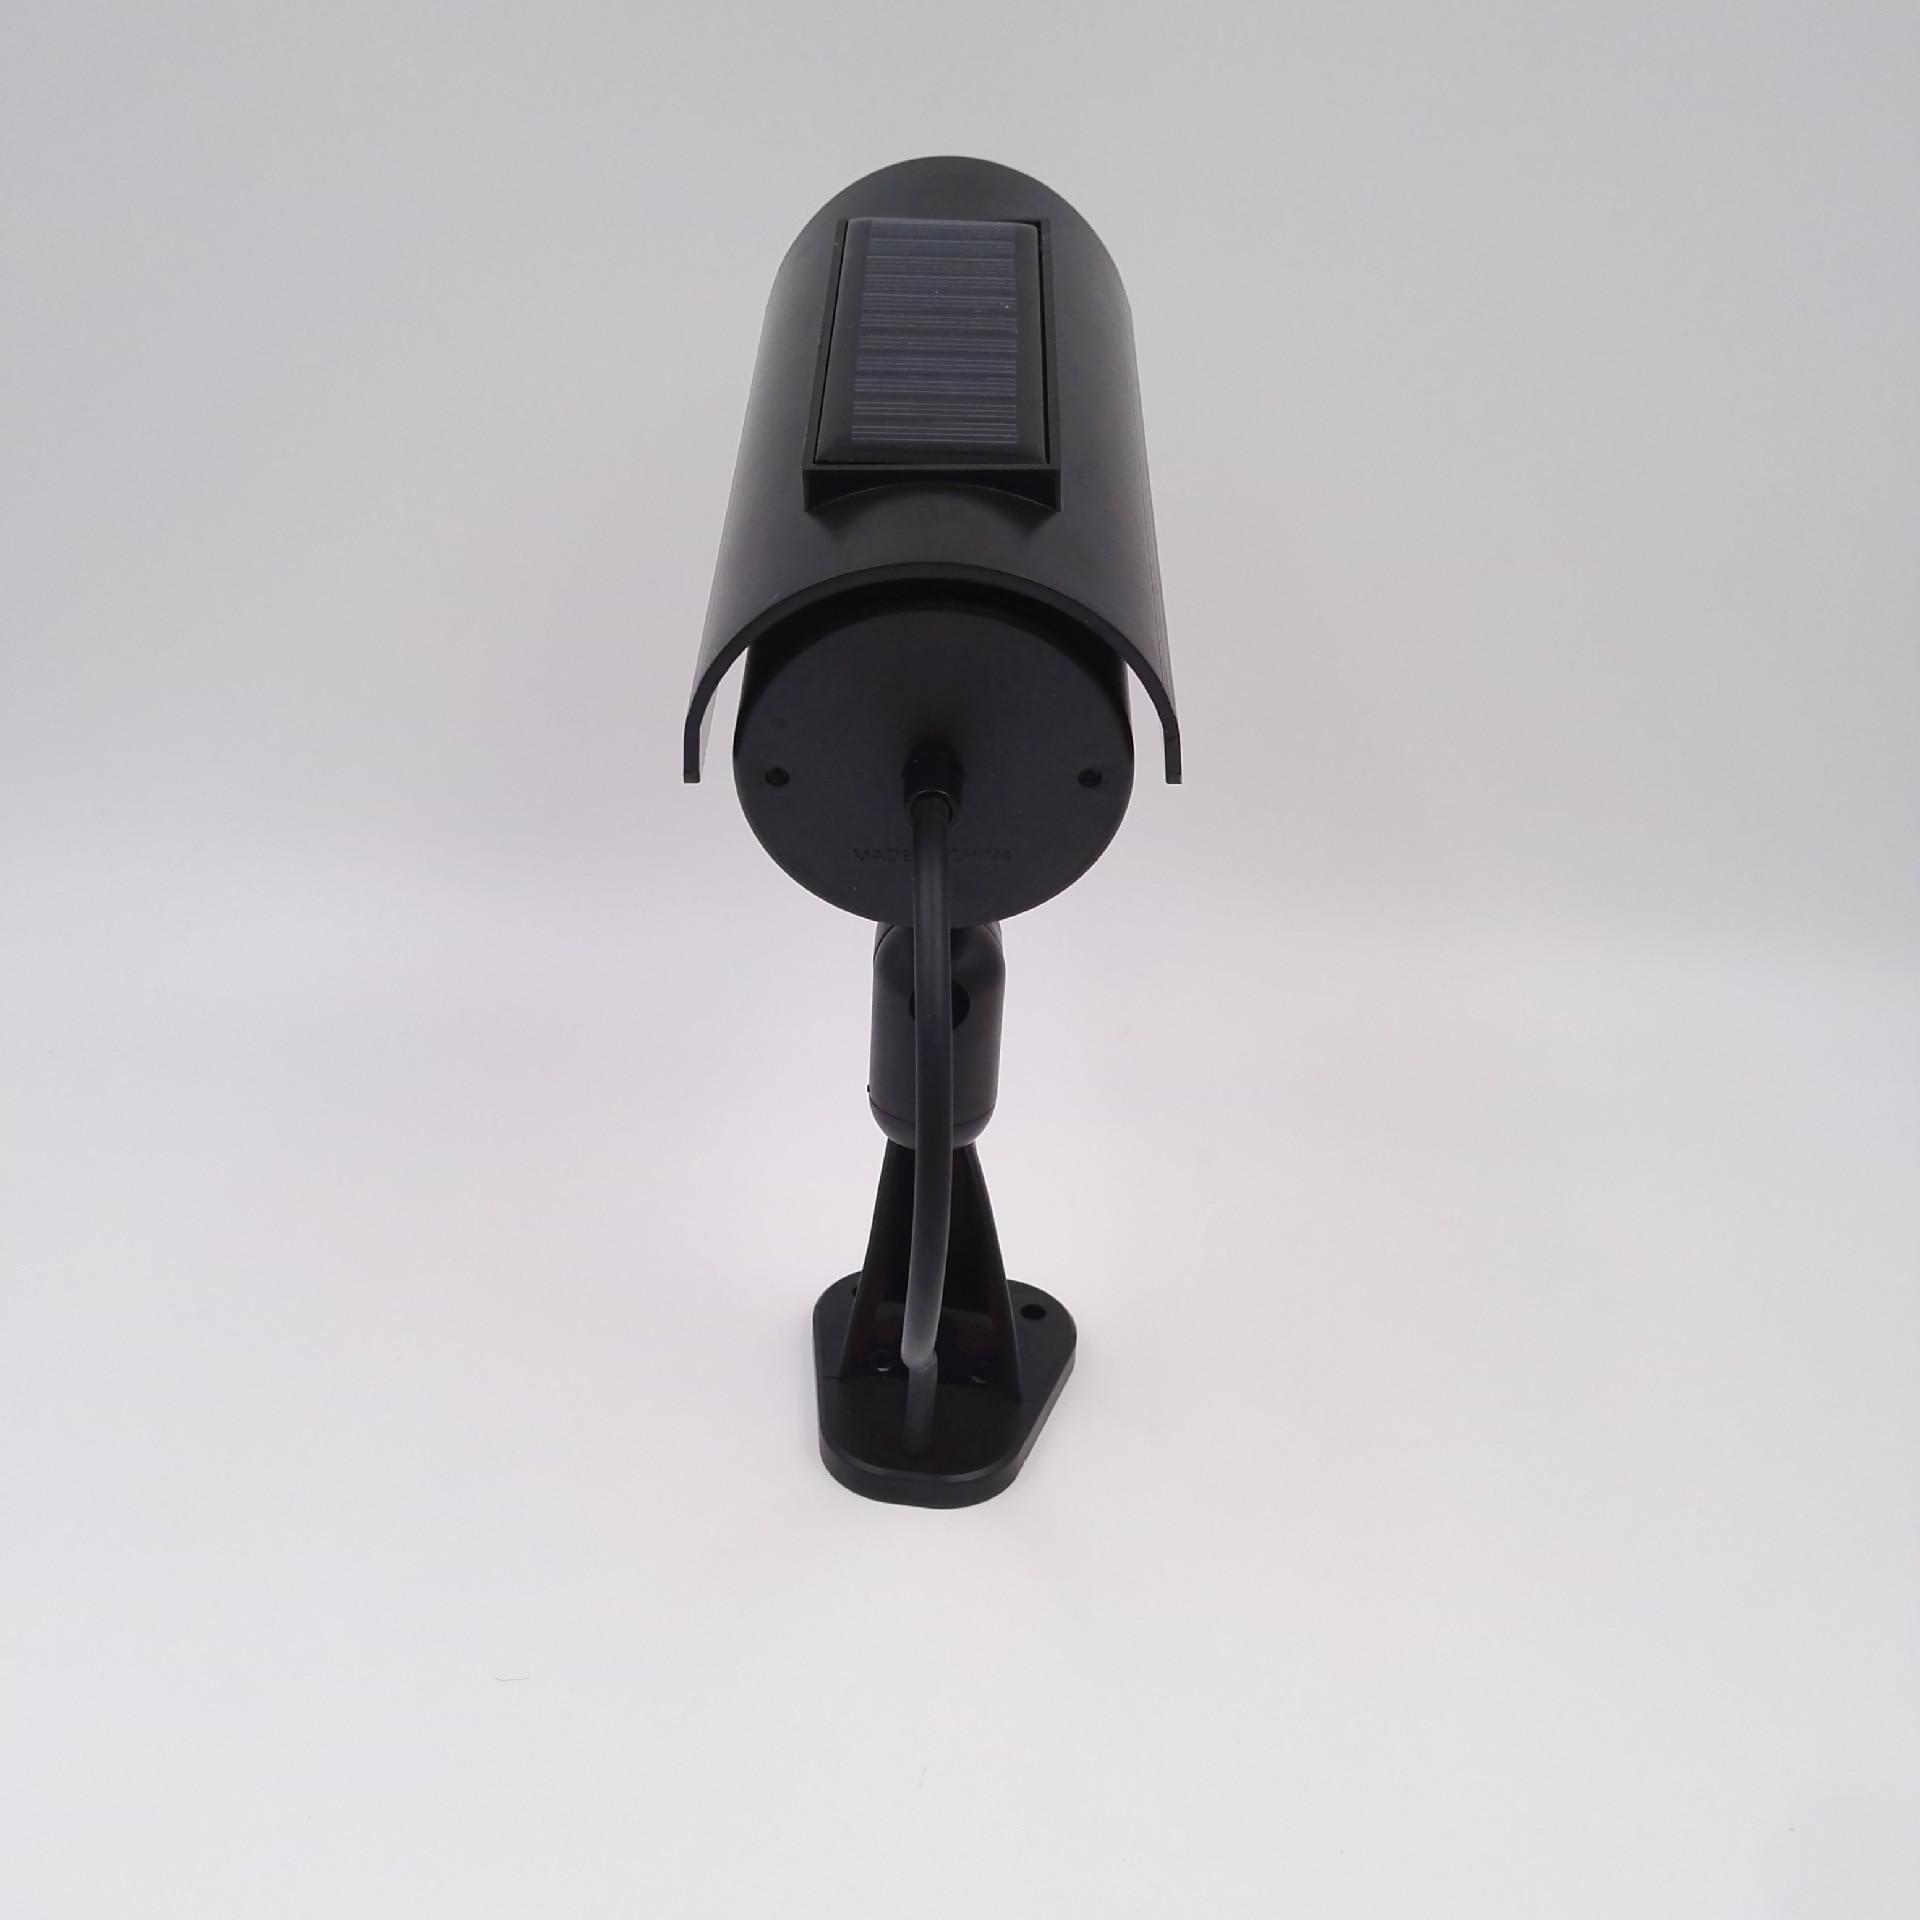 solar dummy camera waterproof fake security ip surveillance